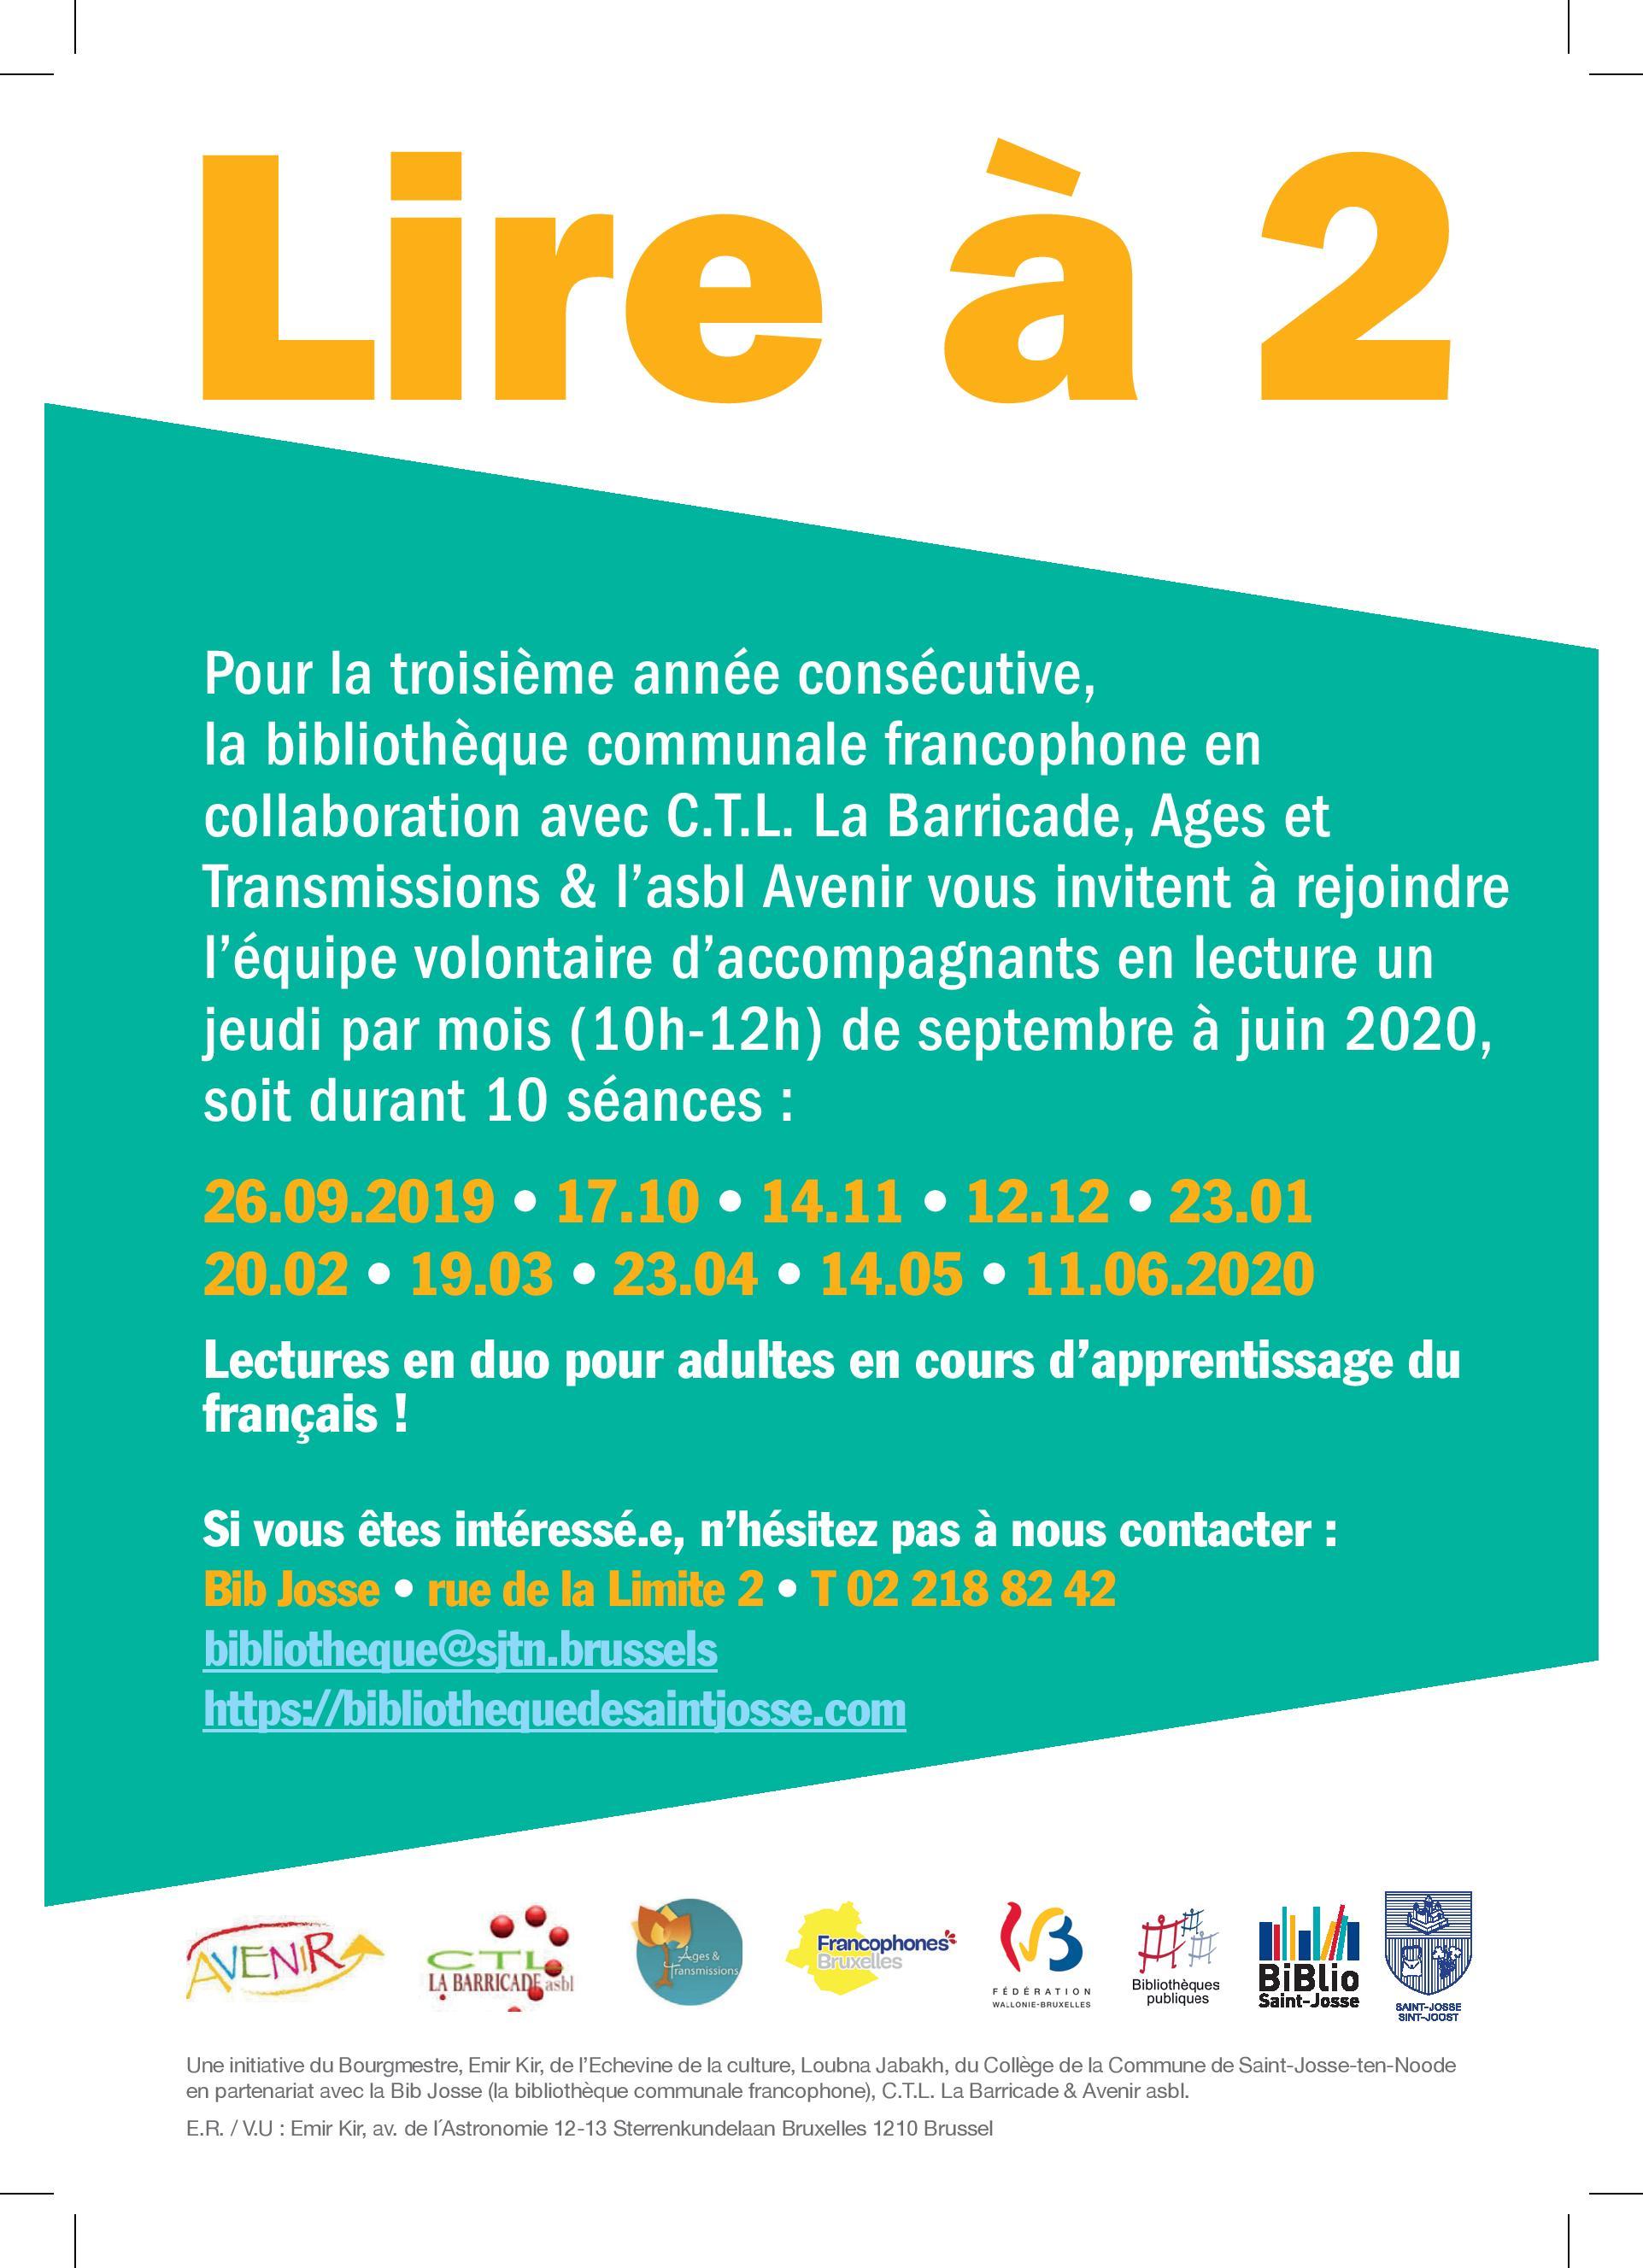 A5_2019-08-02-lire-a-2-page-002.jpg